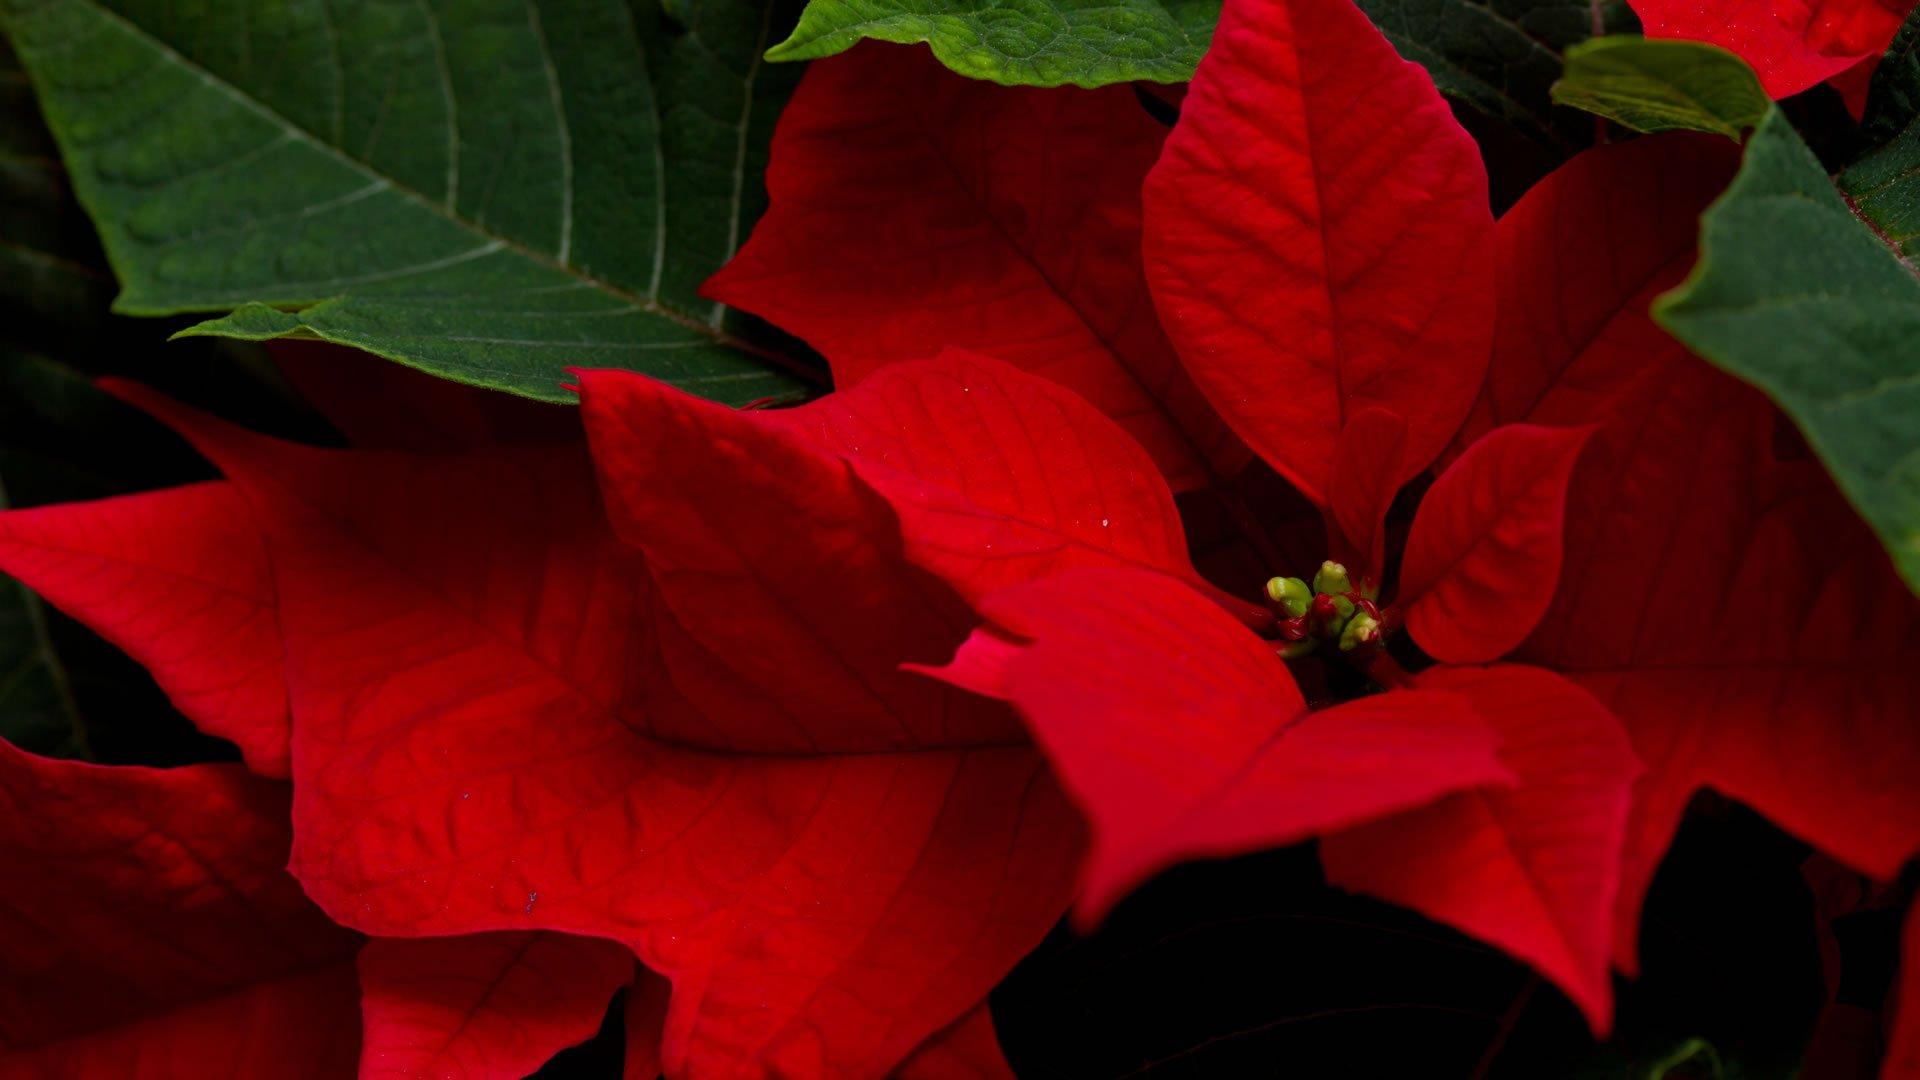 La poisentia o flor de pascua for Entrantes tipicos franceses